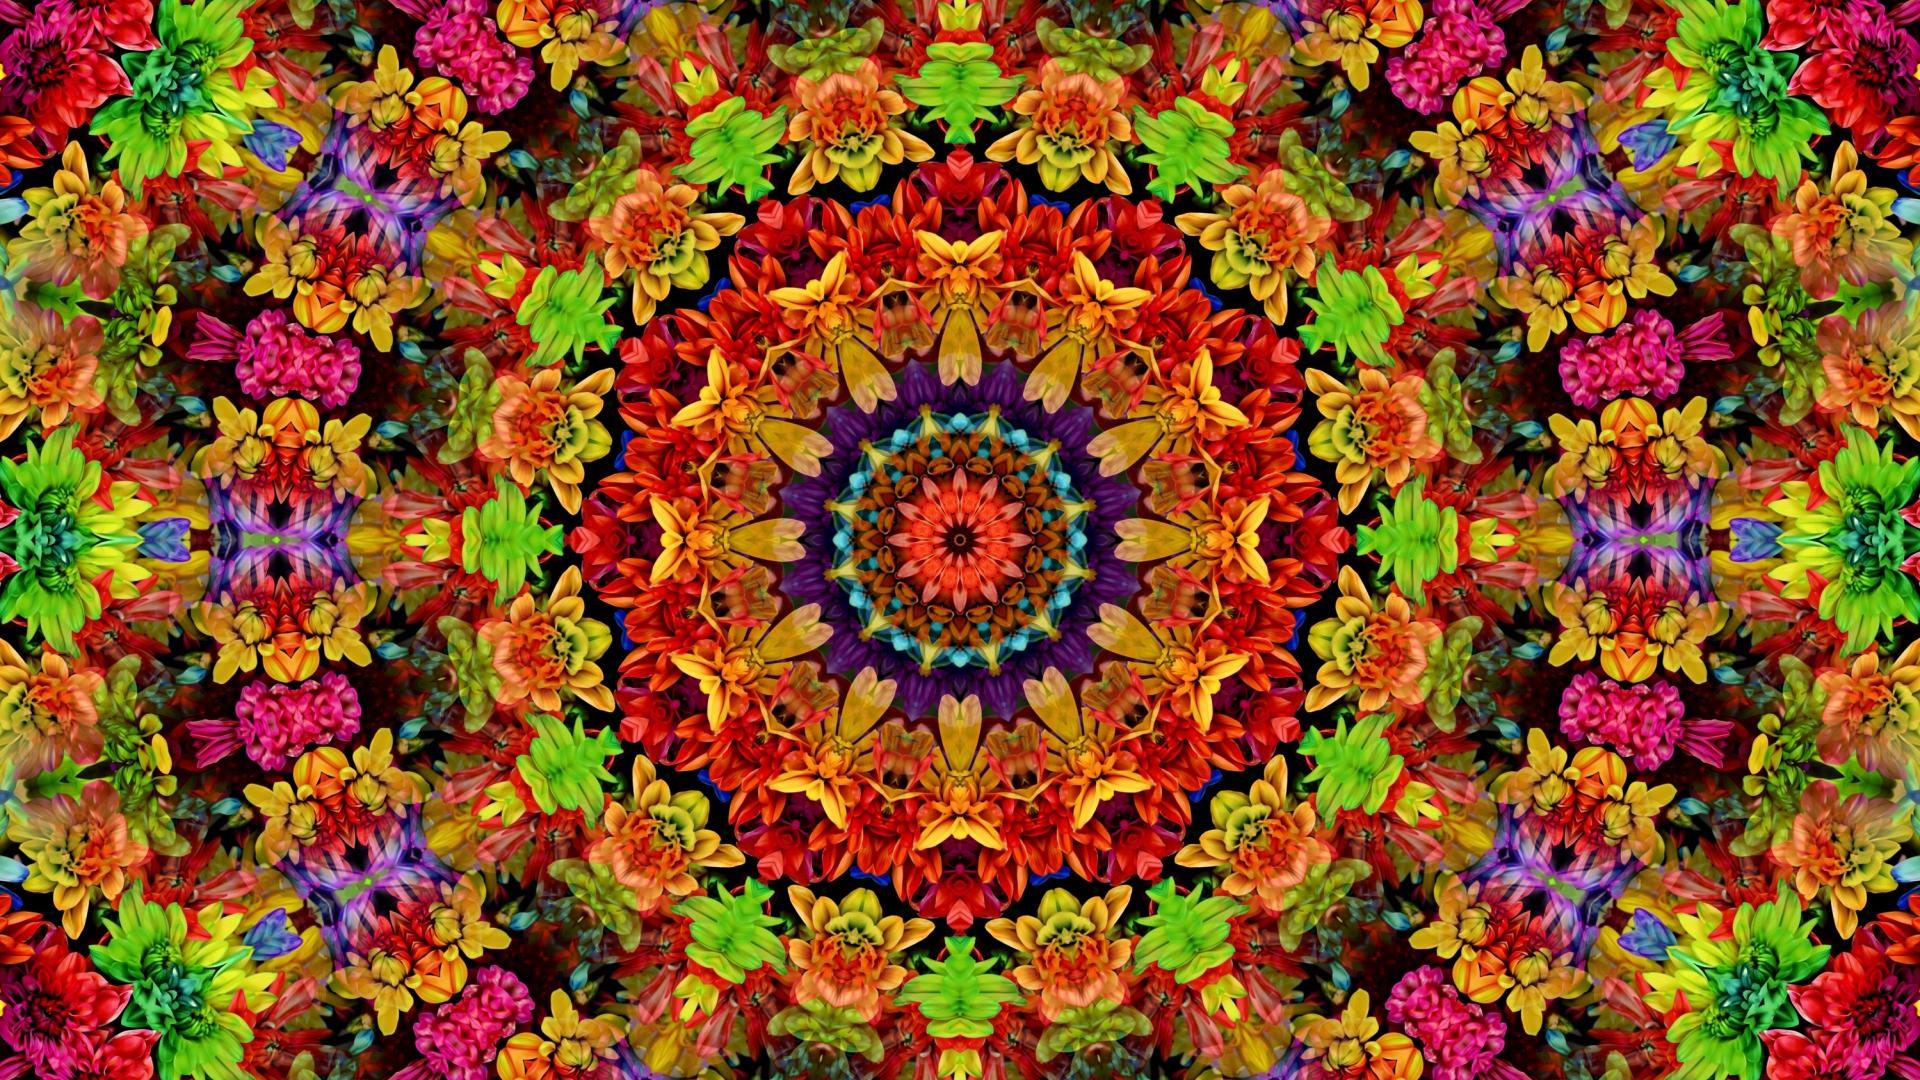 Download 1920x1080 Wallpaper Fractal Mandala Flowers Pattern